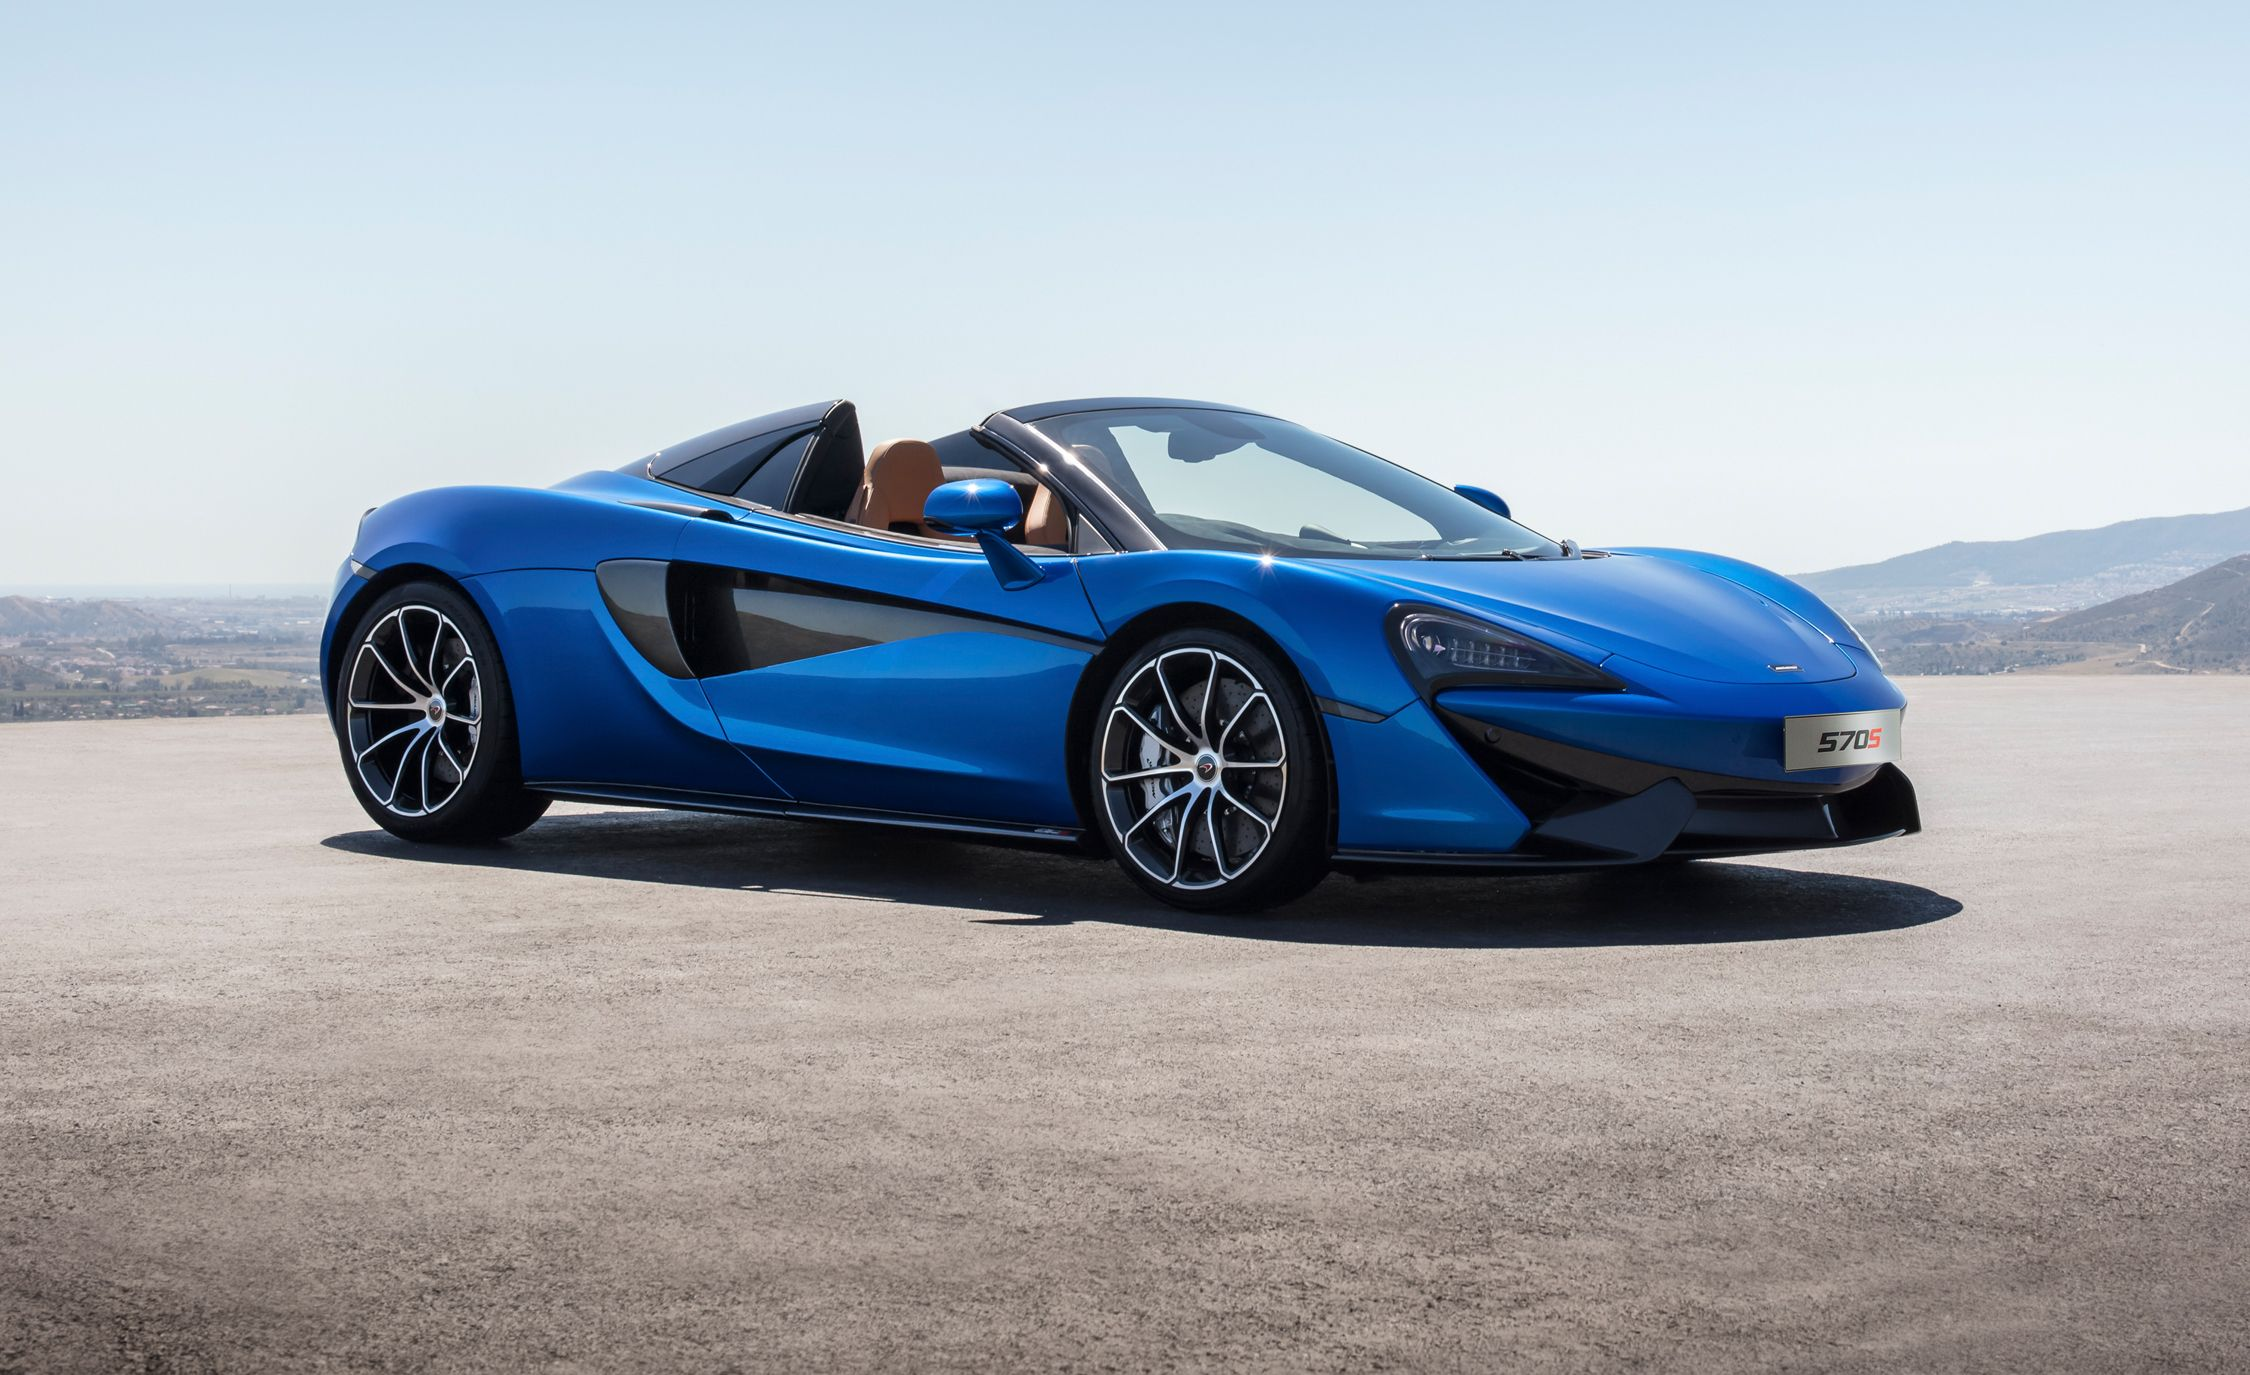 2018 McLaren 570S Spider: The No-Compromise Macca?